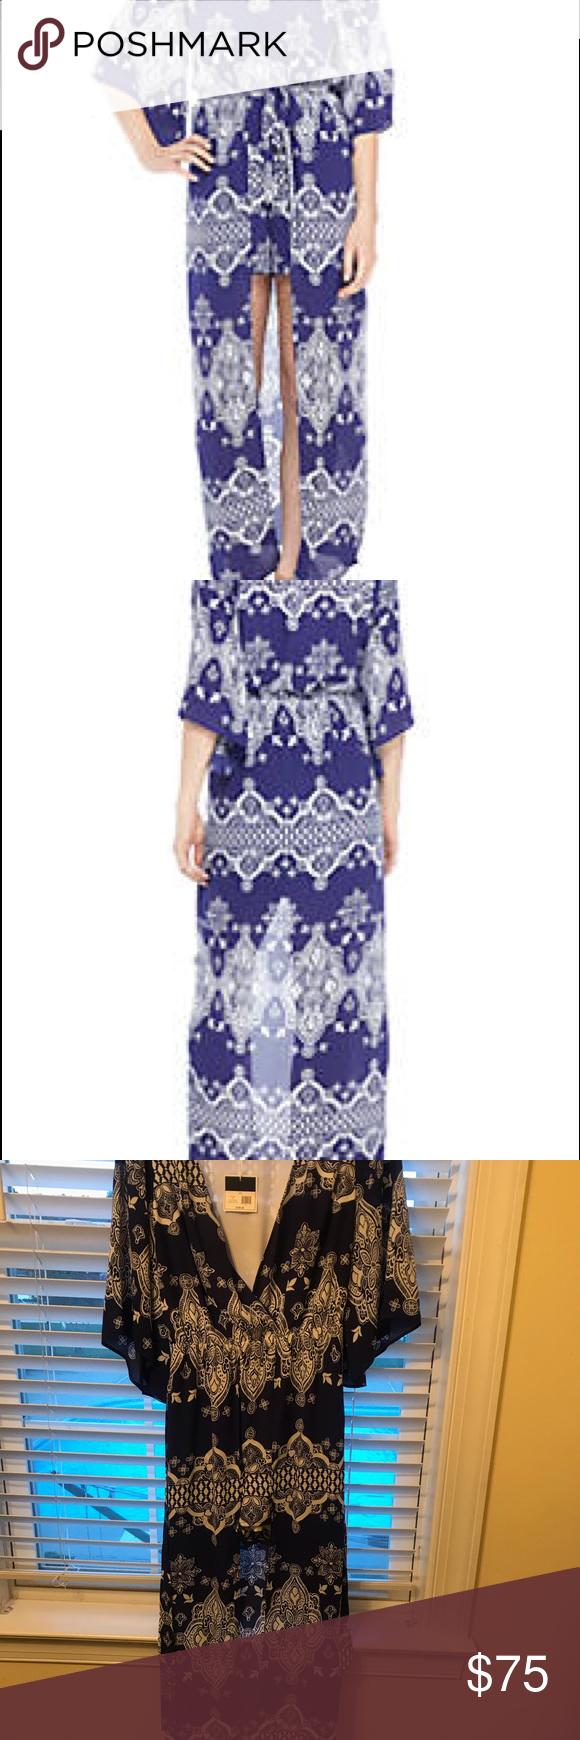 Nwt Kaari Blue Tie Waist High Low Maxi Romper 57 5 L Elastic Waistband V Neck Short Flare Sleeves Machine Washable Or Dry C Fashion Maxi Romper High Low Dress [ 1740 x 580 Pixel ]